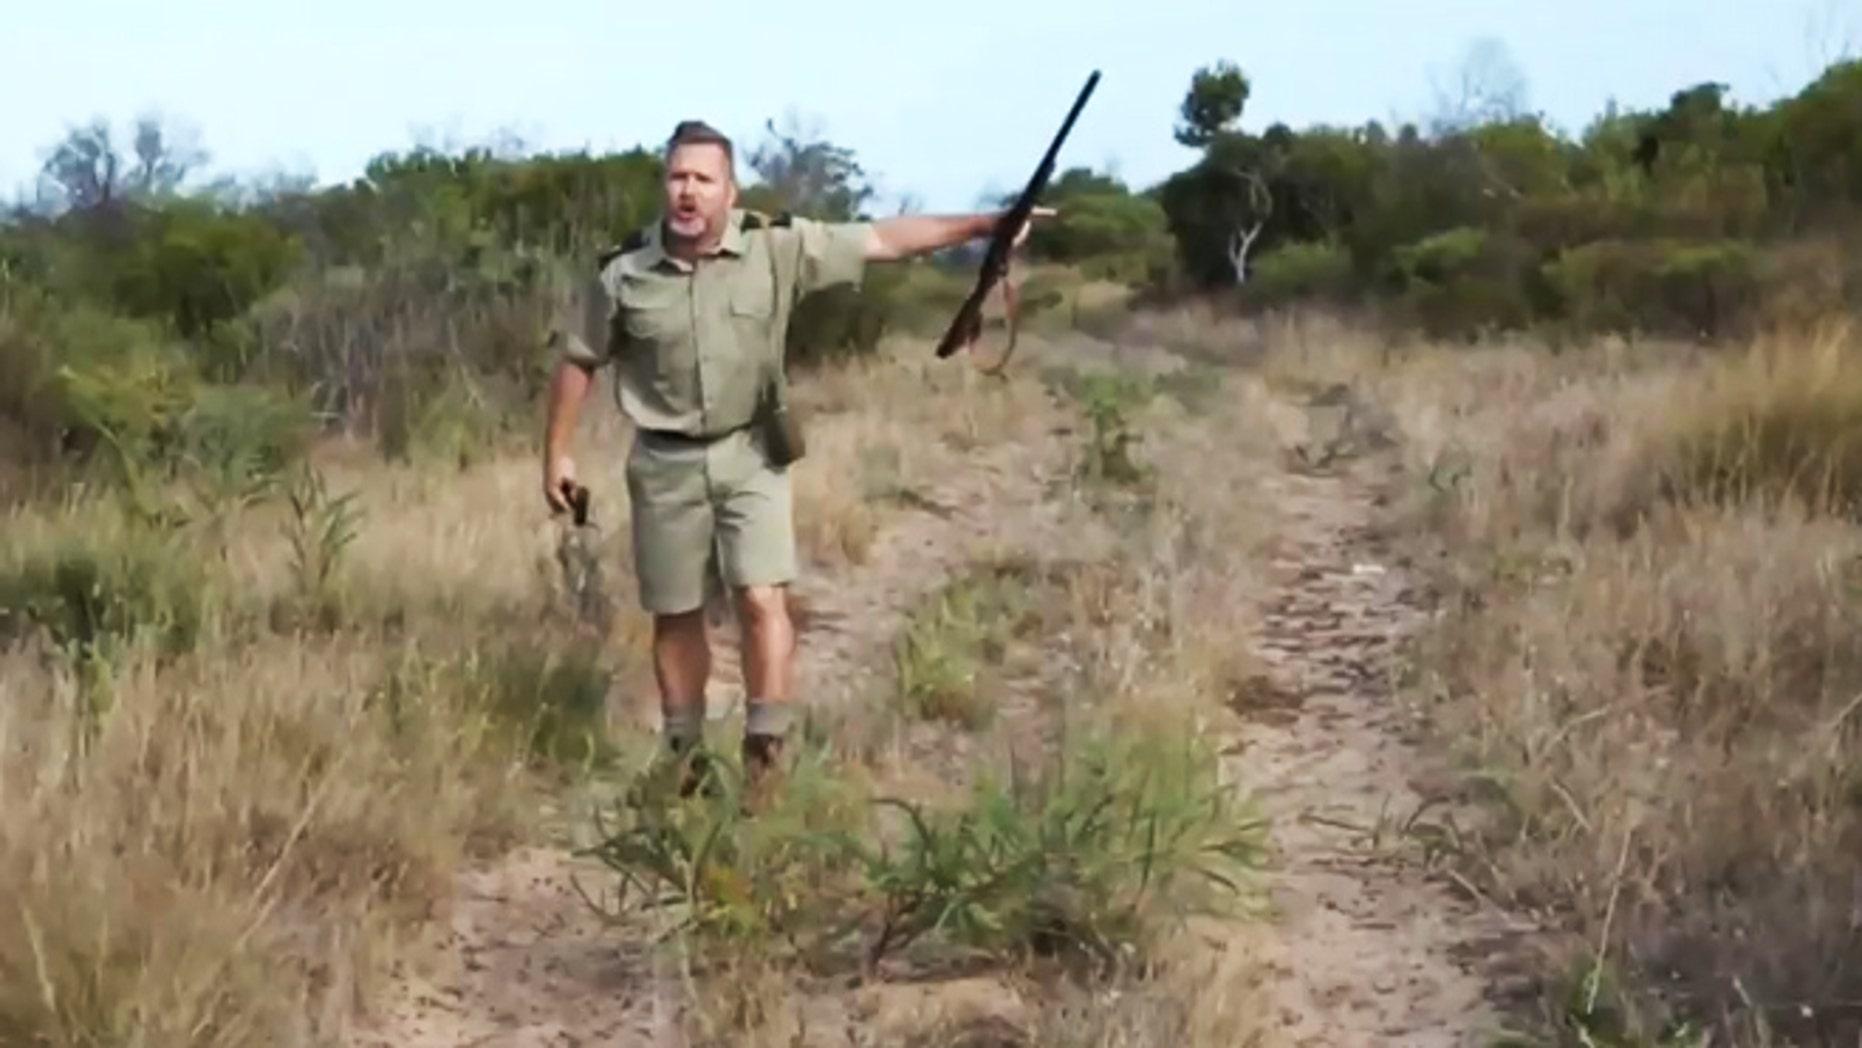 A safari park ranger is understandably upset when a tourist goes rogue.